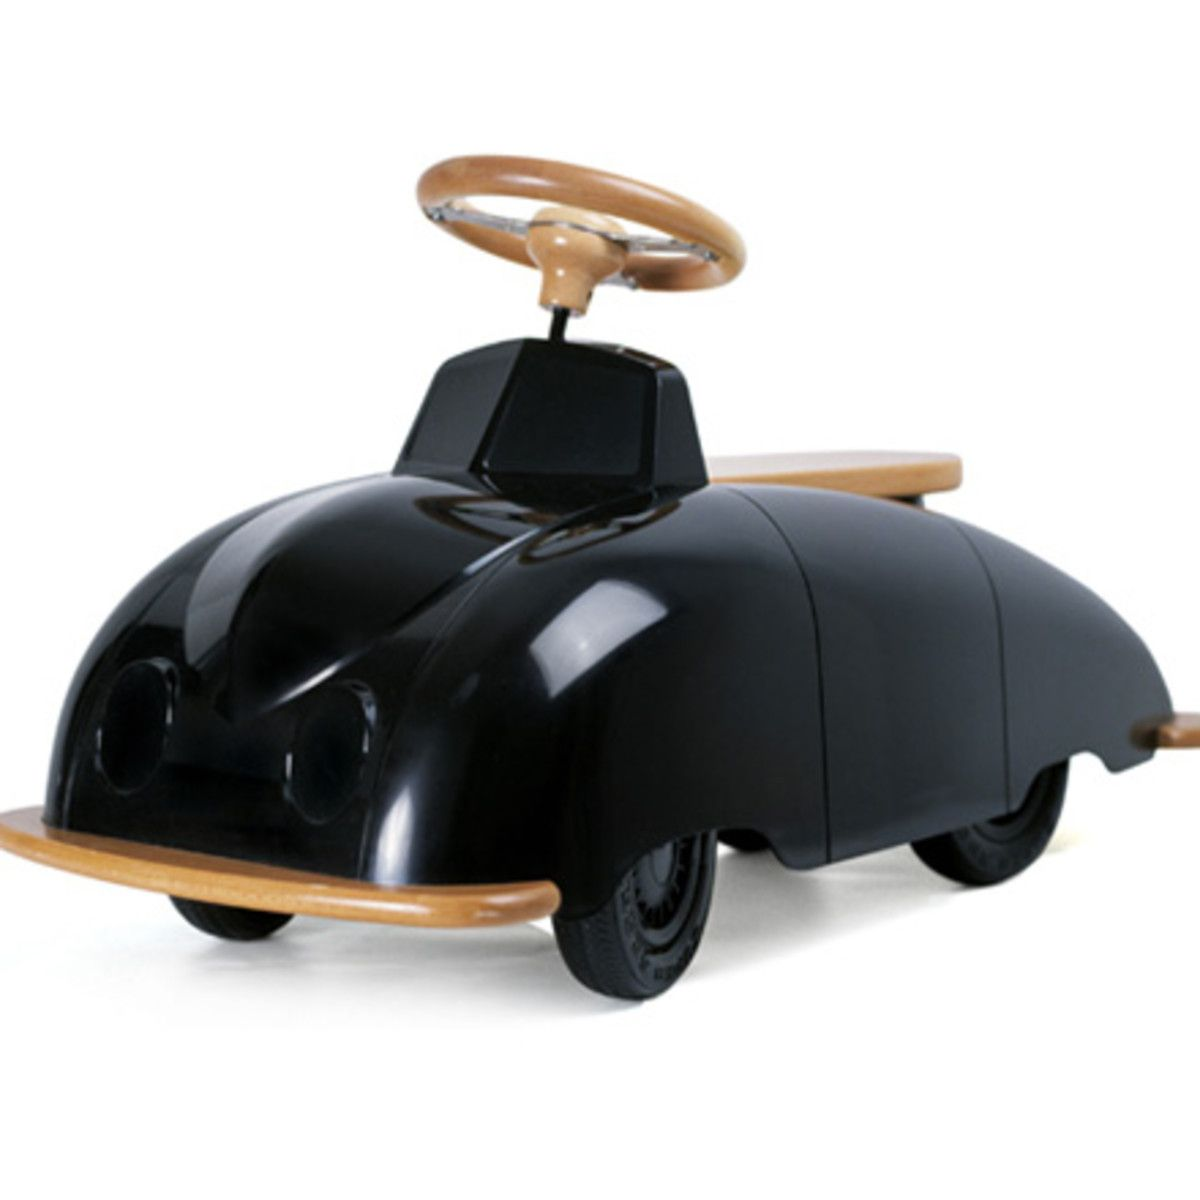 Car 3 toys  Playsam  Roadster SAAB Car uc  Crafted Toys  Pinterest  Cars